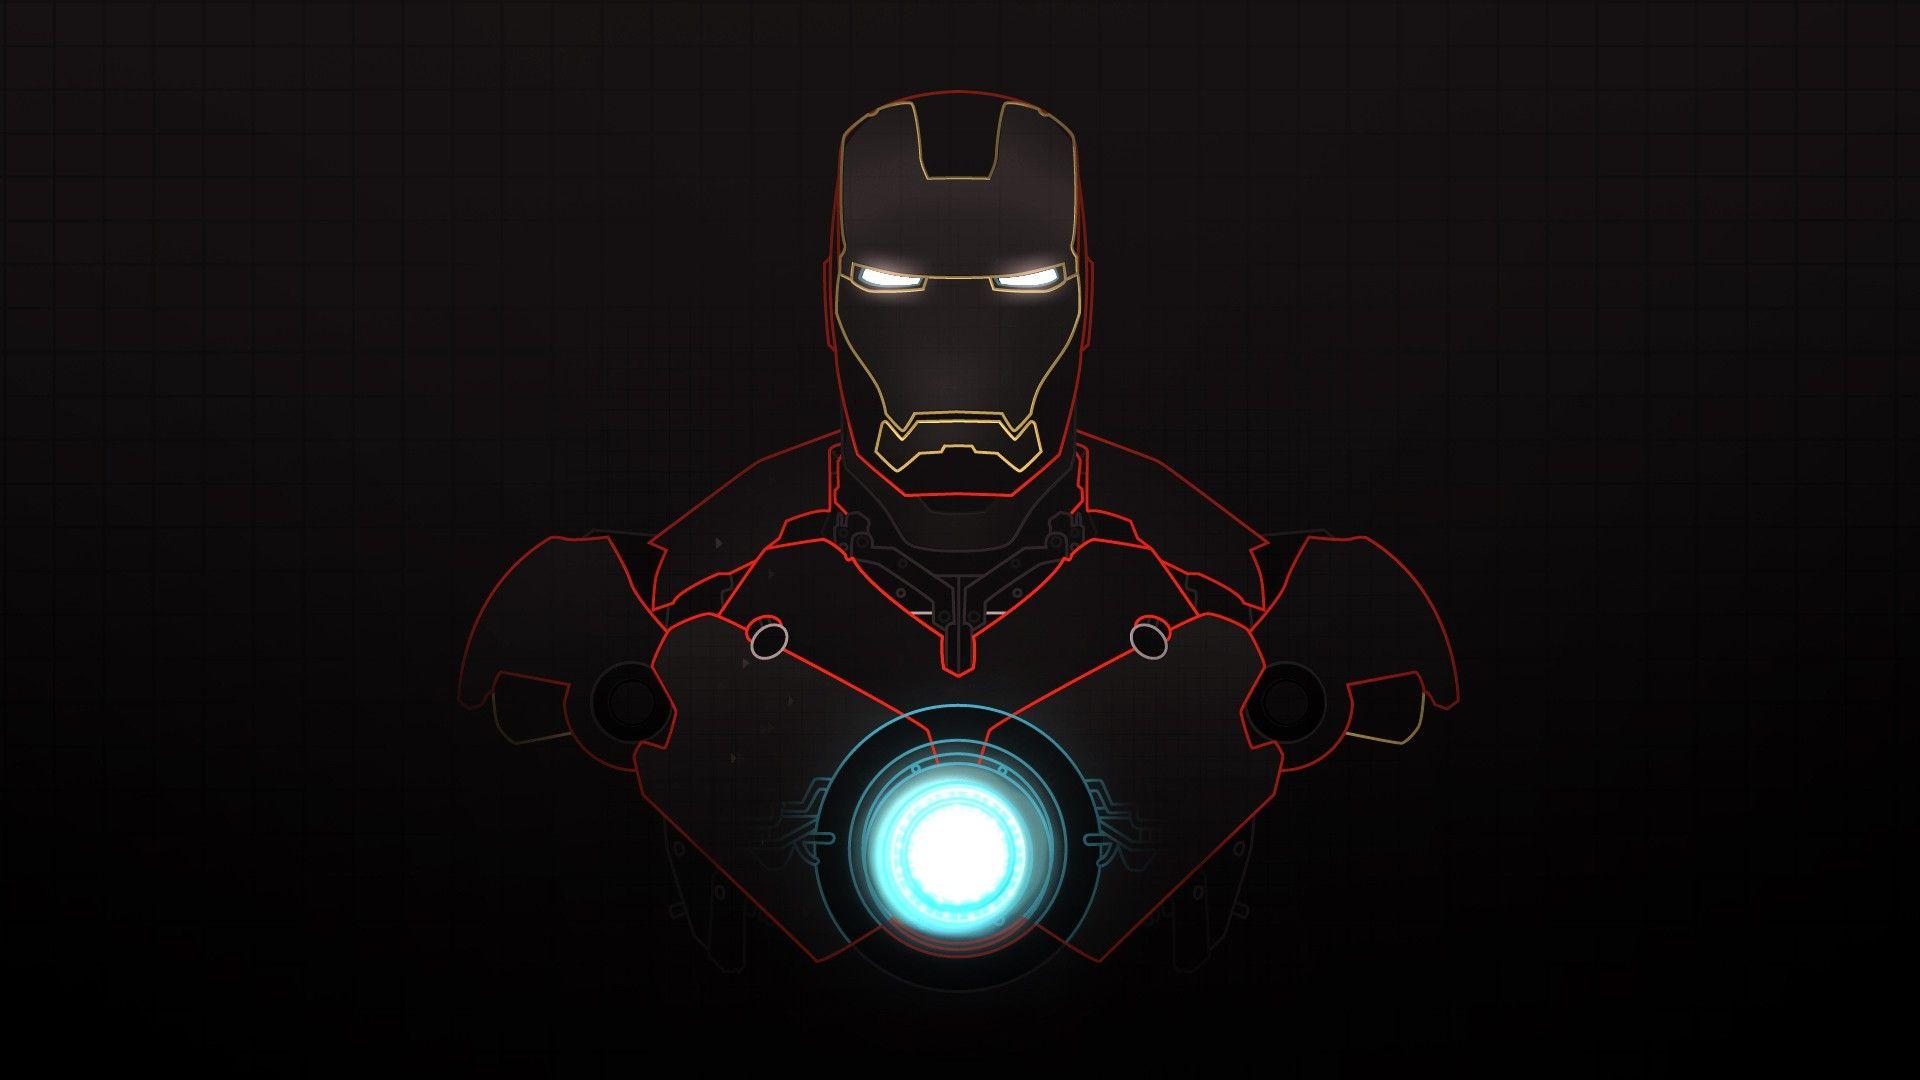 Iron Man Vector Artwork Marvel Comics Graphic Art 1920x1080 Wallpaper Iron Man Hd Wallpaper Man Wallpaper Iron Man Wallpaper